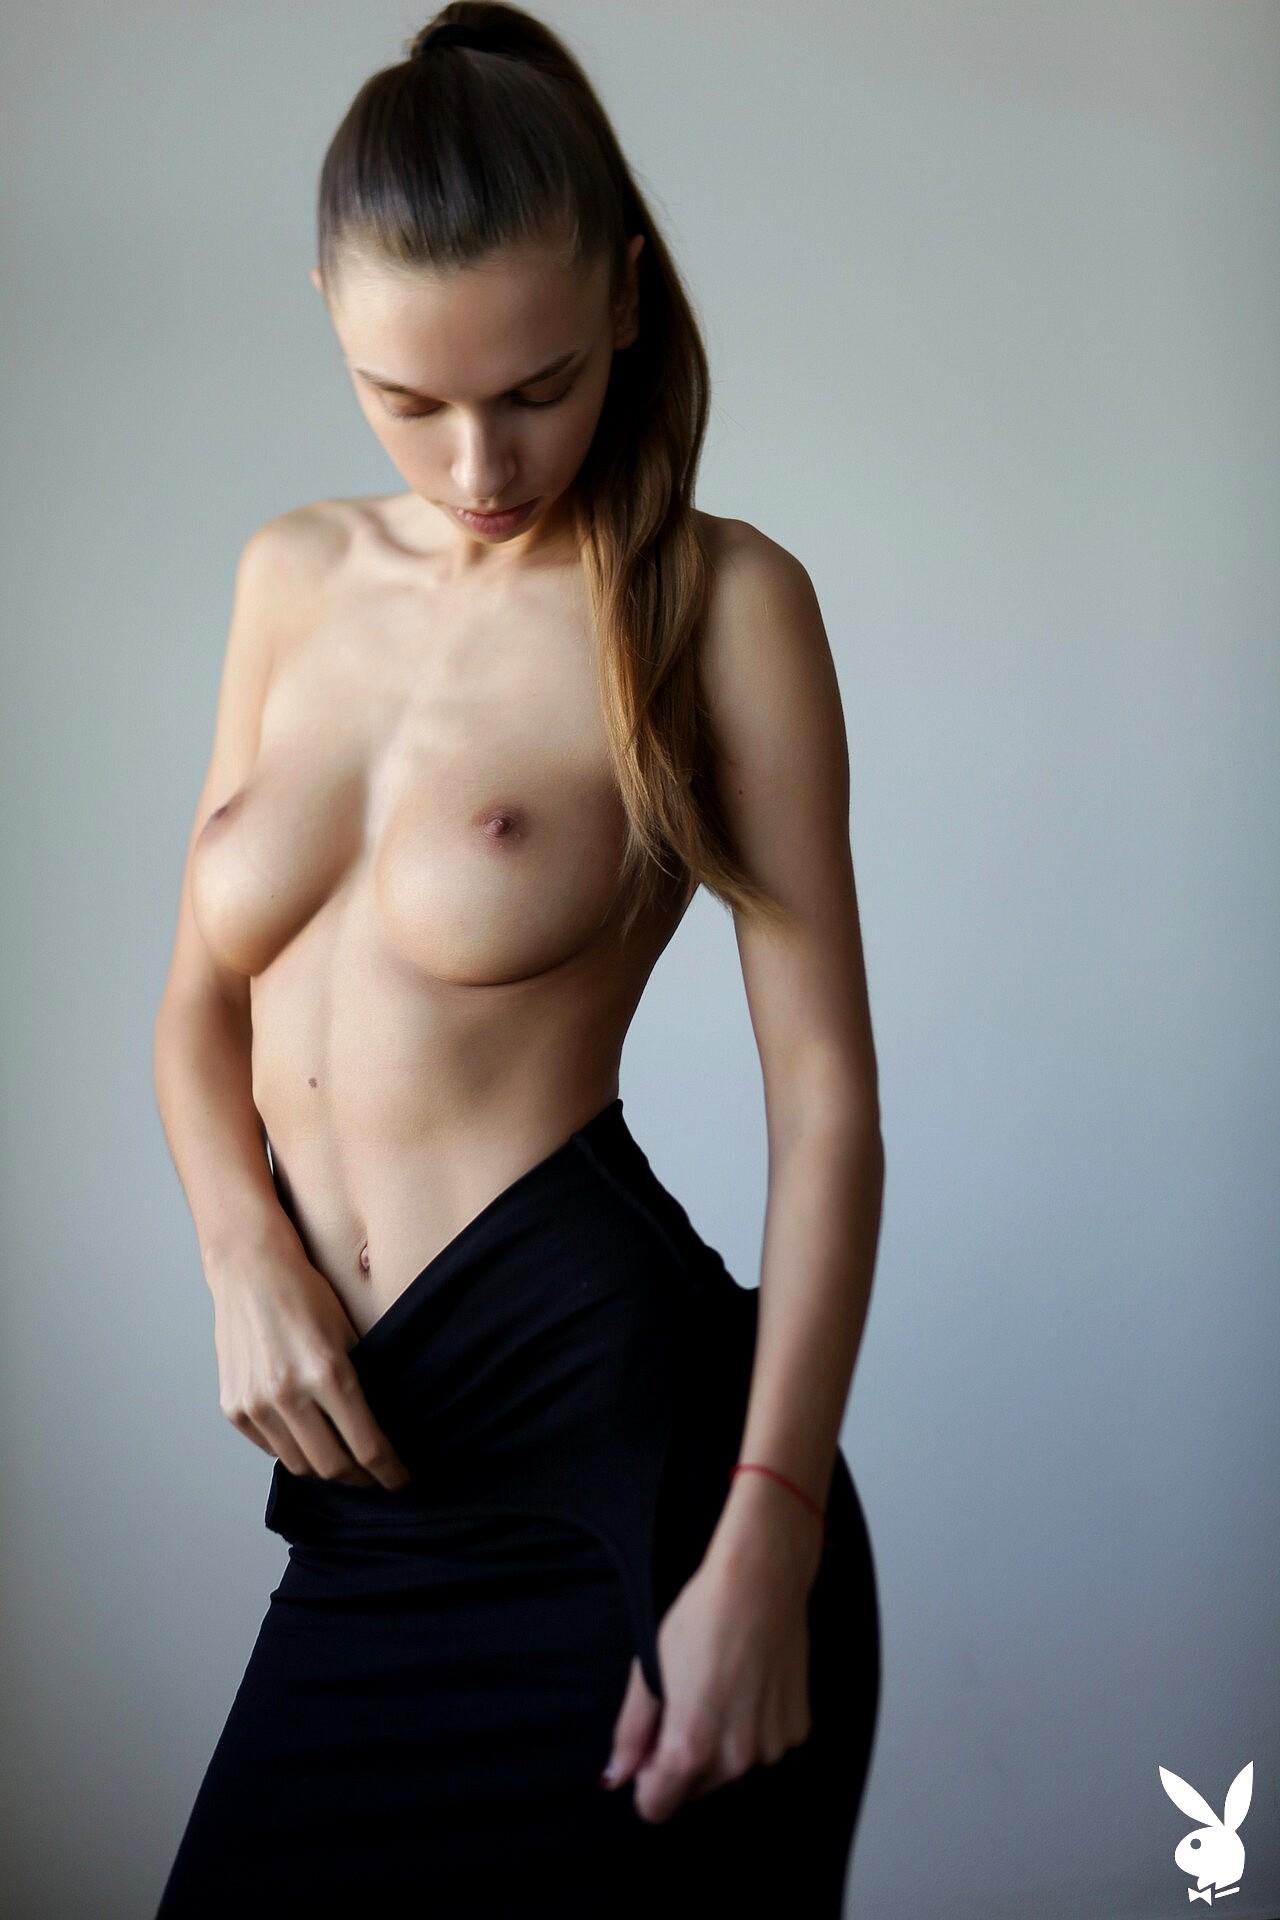 Playboy Plus Elin Spearmypussy Big Tits Pornpics Sex Hd Pics-7919